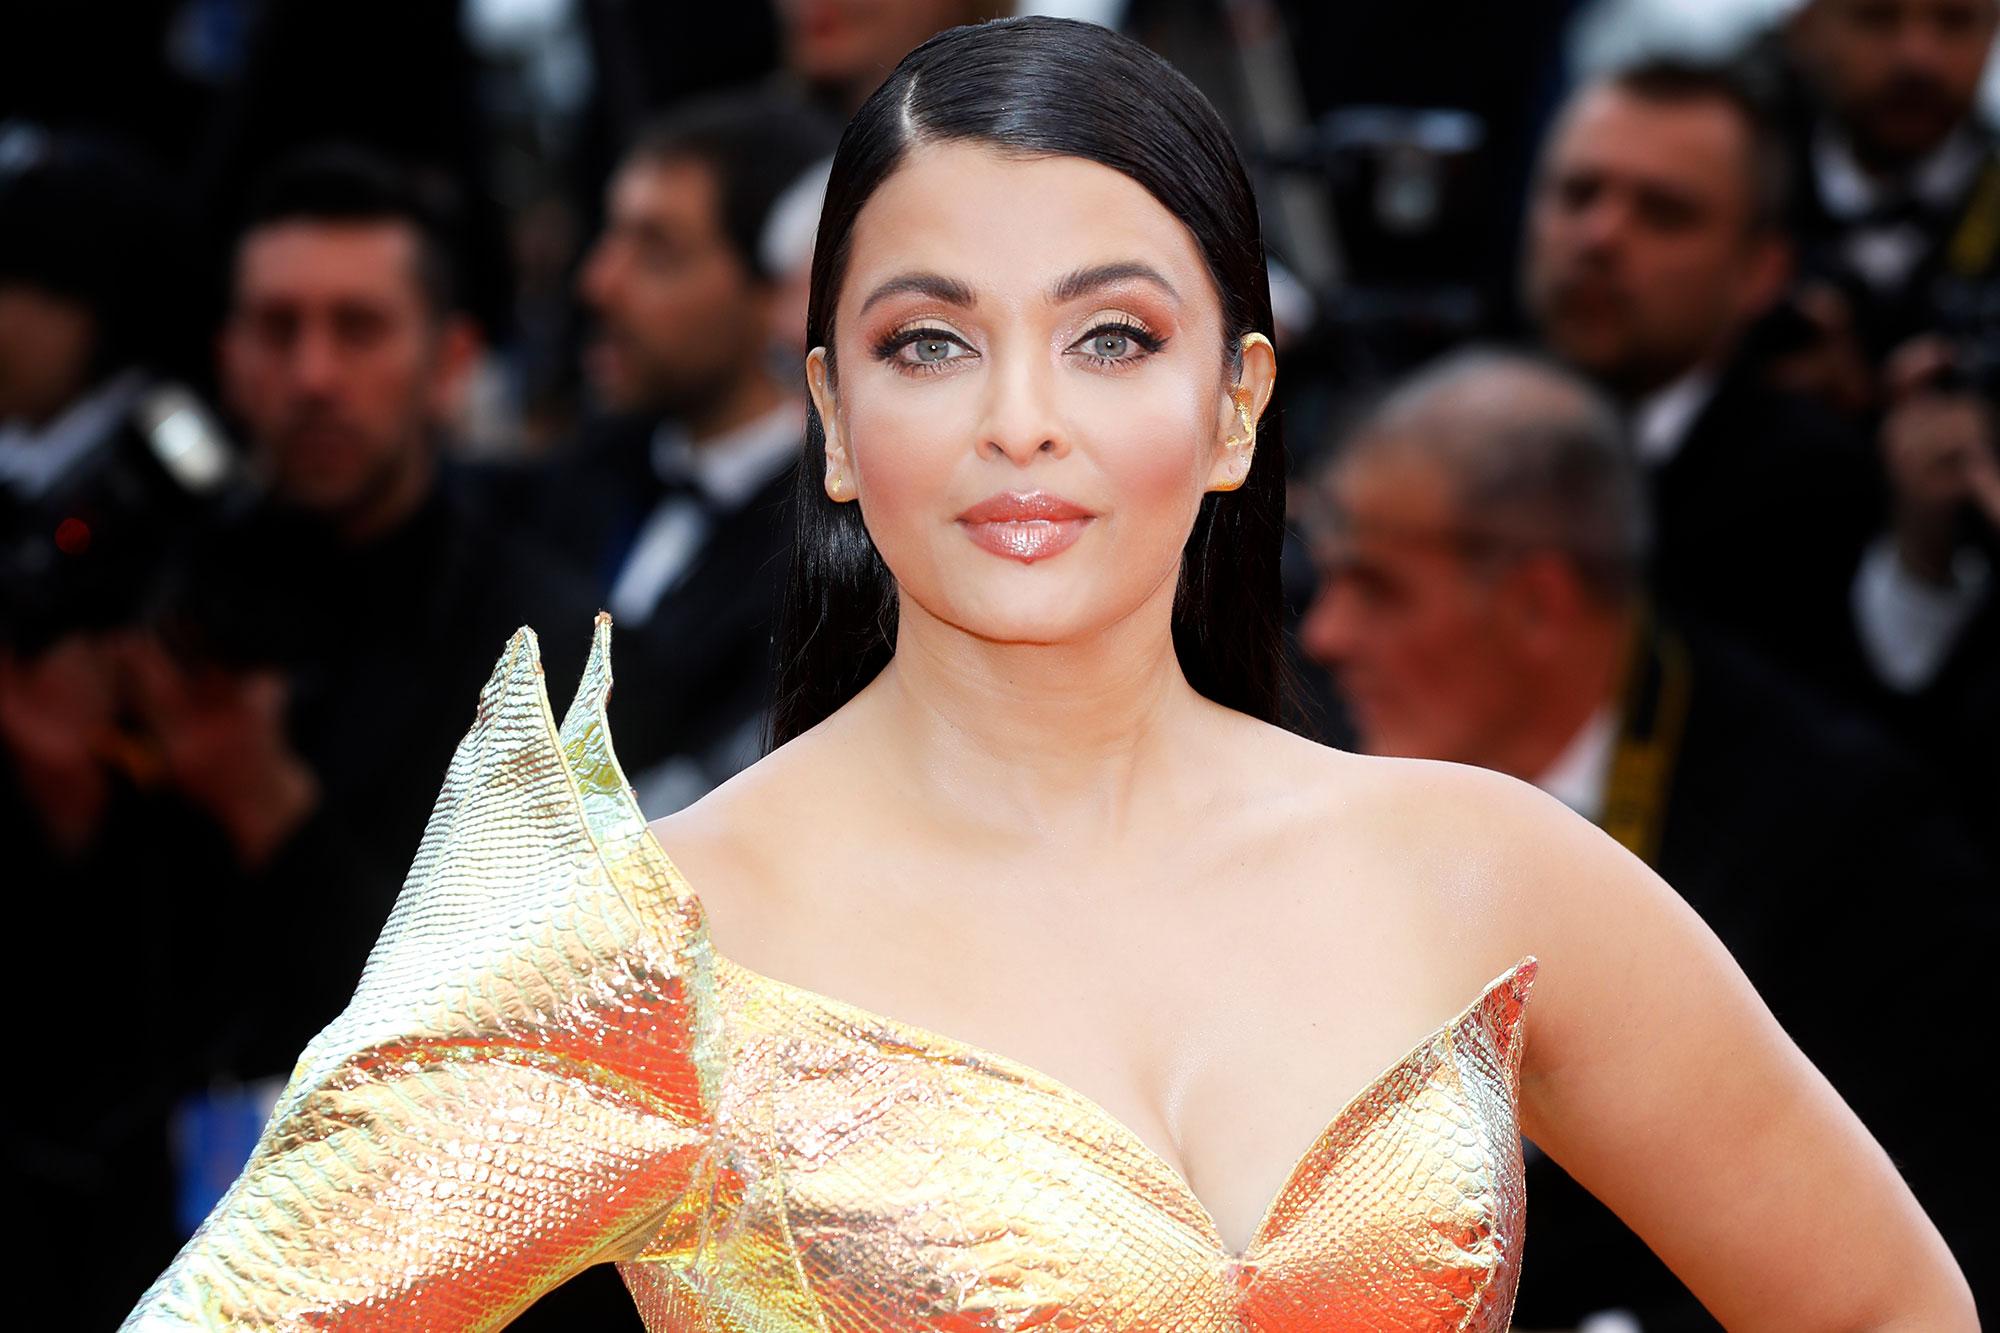 Bollywood star Aishwarya Rai Bachchan tests positive for coronavirus |  EW.com